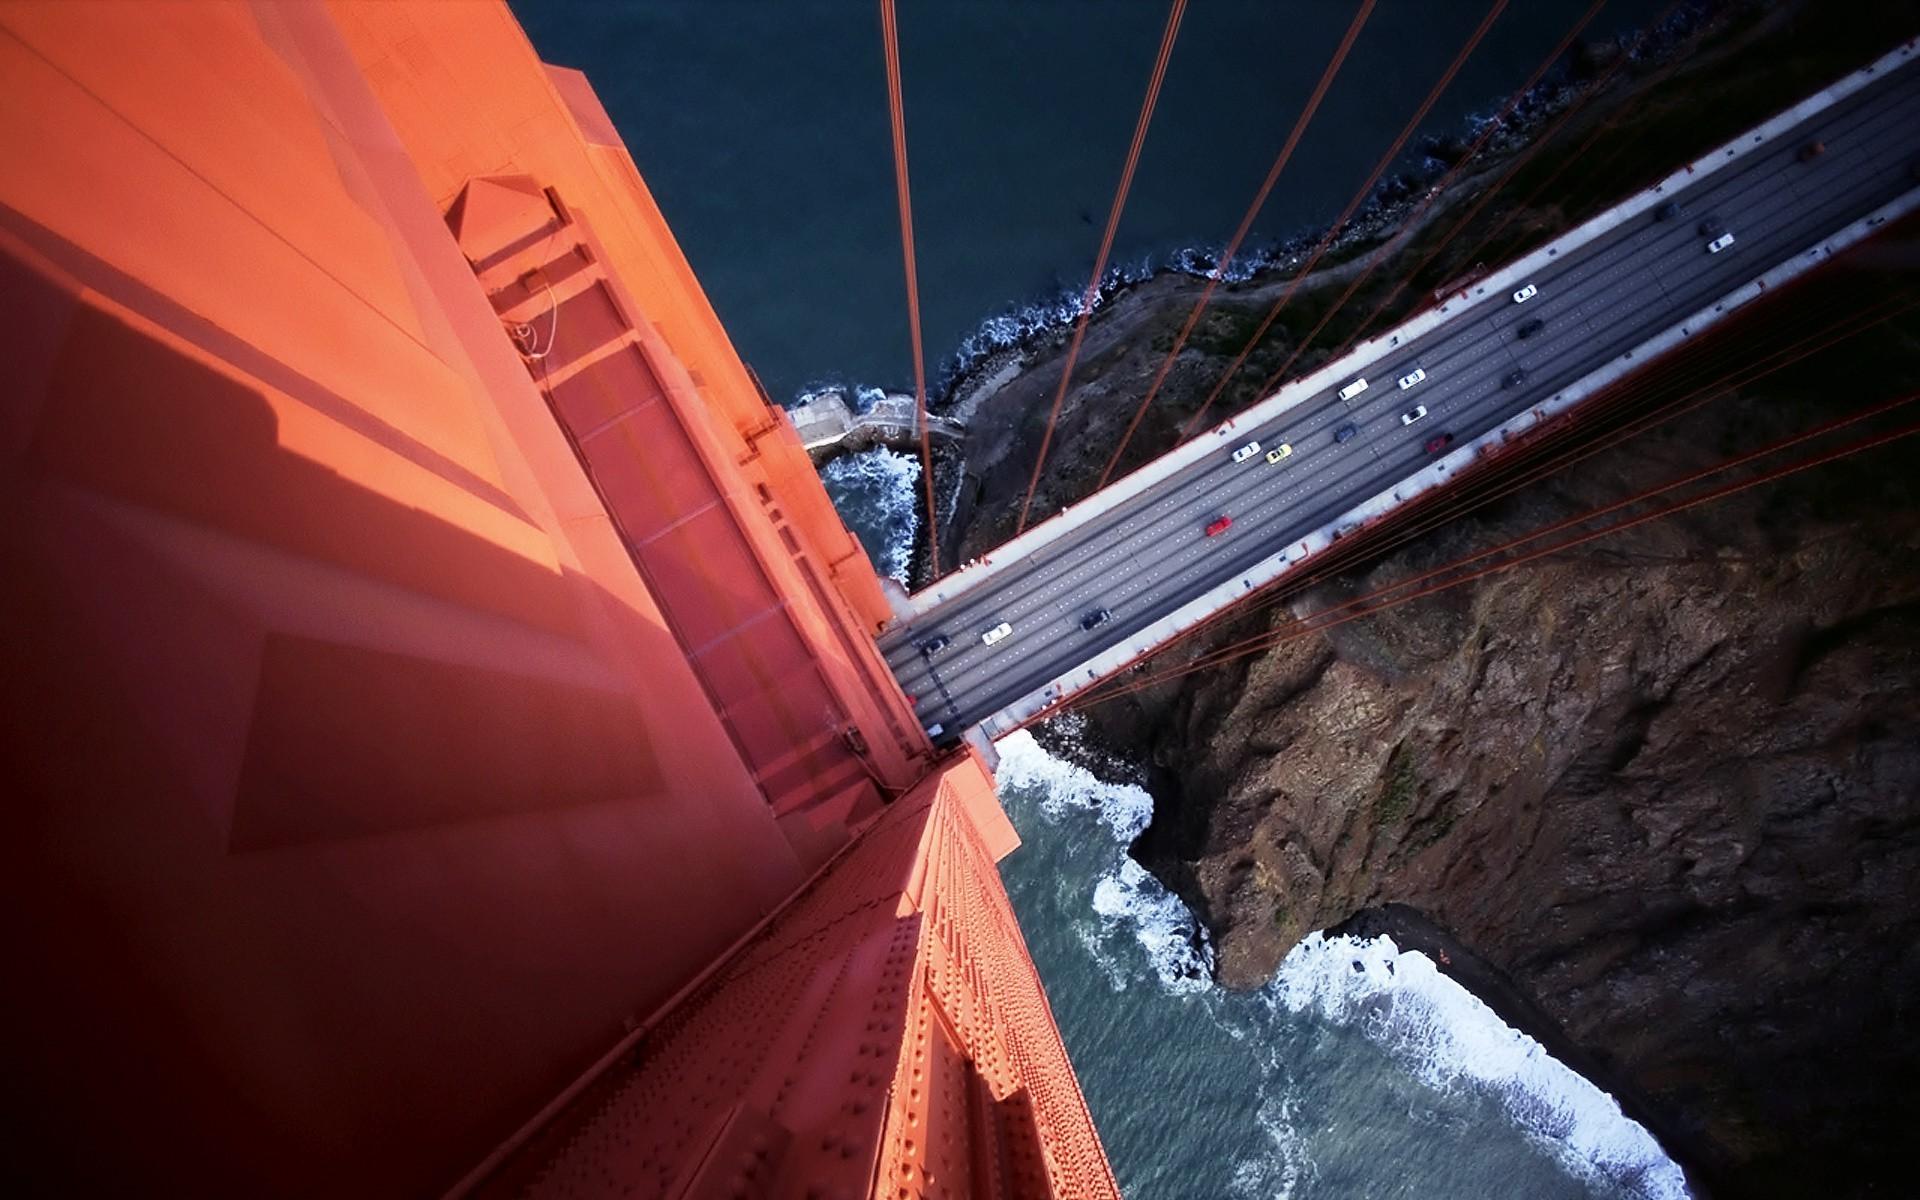 Amazing Wallpaper Night Golden Gate Bridge - sunlight-night-rock-reflection-vehicle-road-blue-bridge-San-Francisco-aerial-view-Golden-Gate-Bridge-light-color-darkness-screenshot-1920x1200-px-Birds-Eye-View-atmosphere-of-earth-529108  HD-26881.jpg